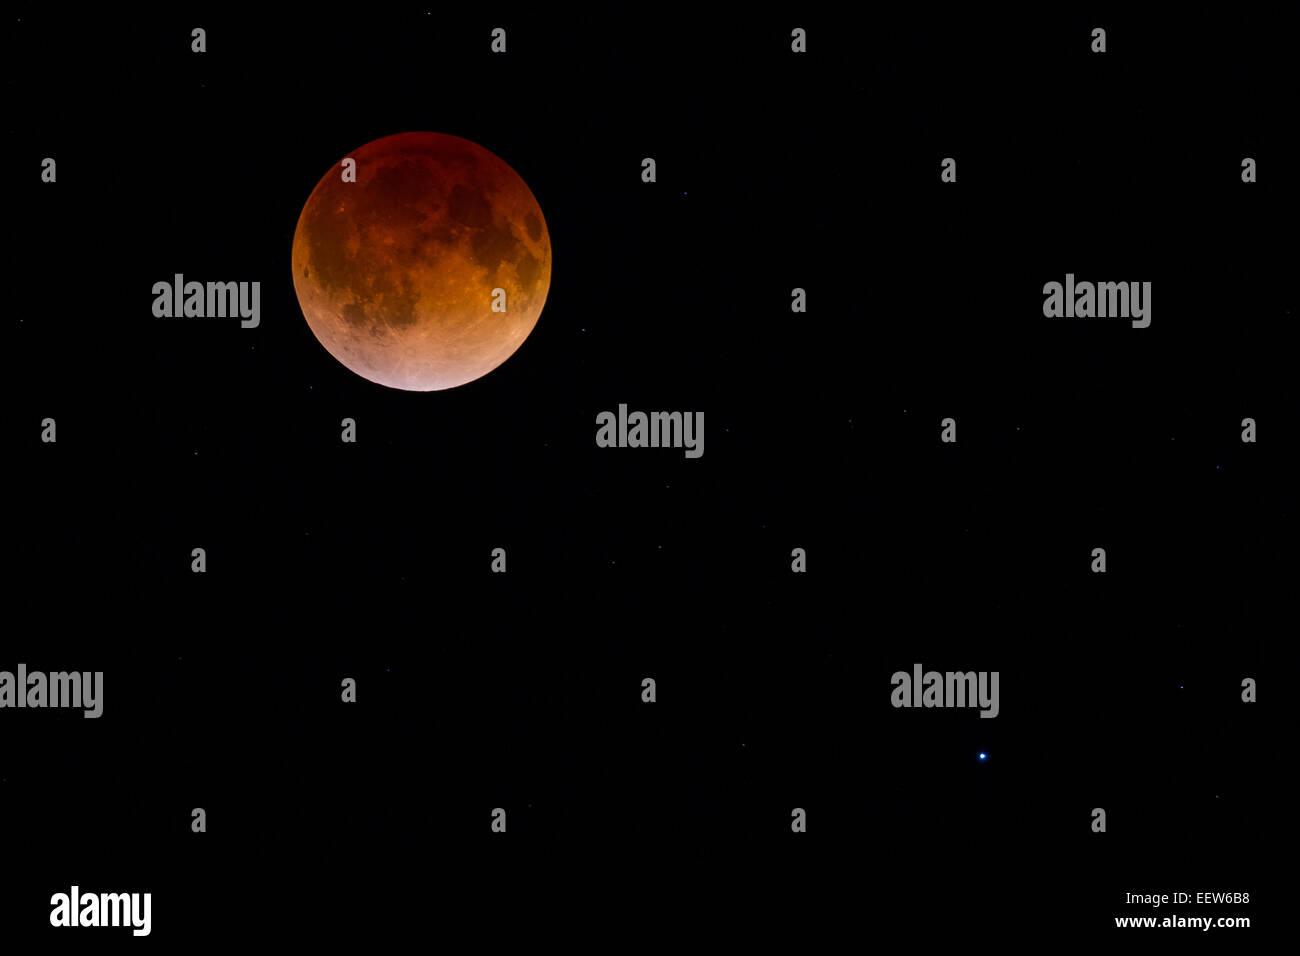 Spica Star Stock Photos & Spica Star Stock Images - Alamy